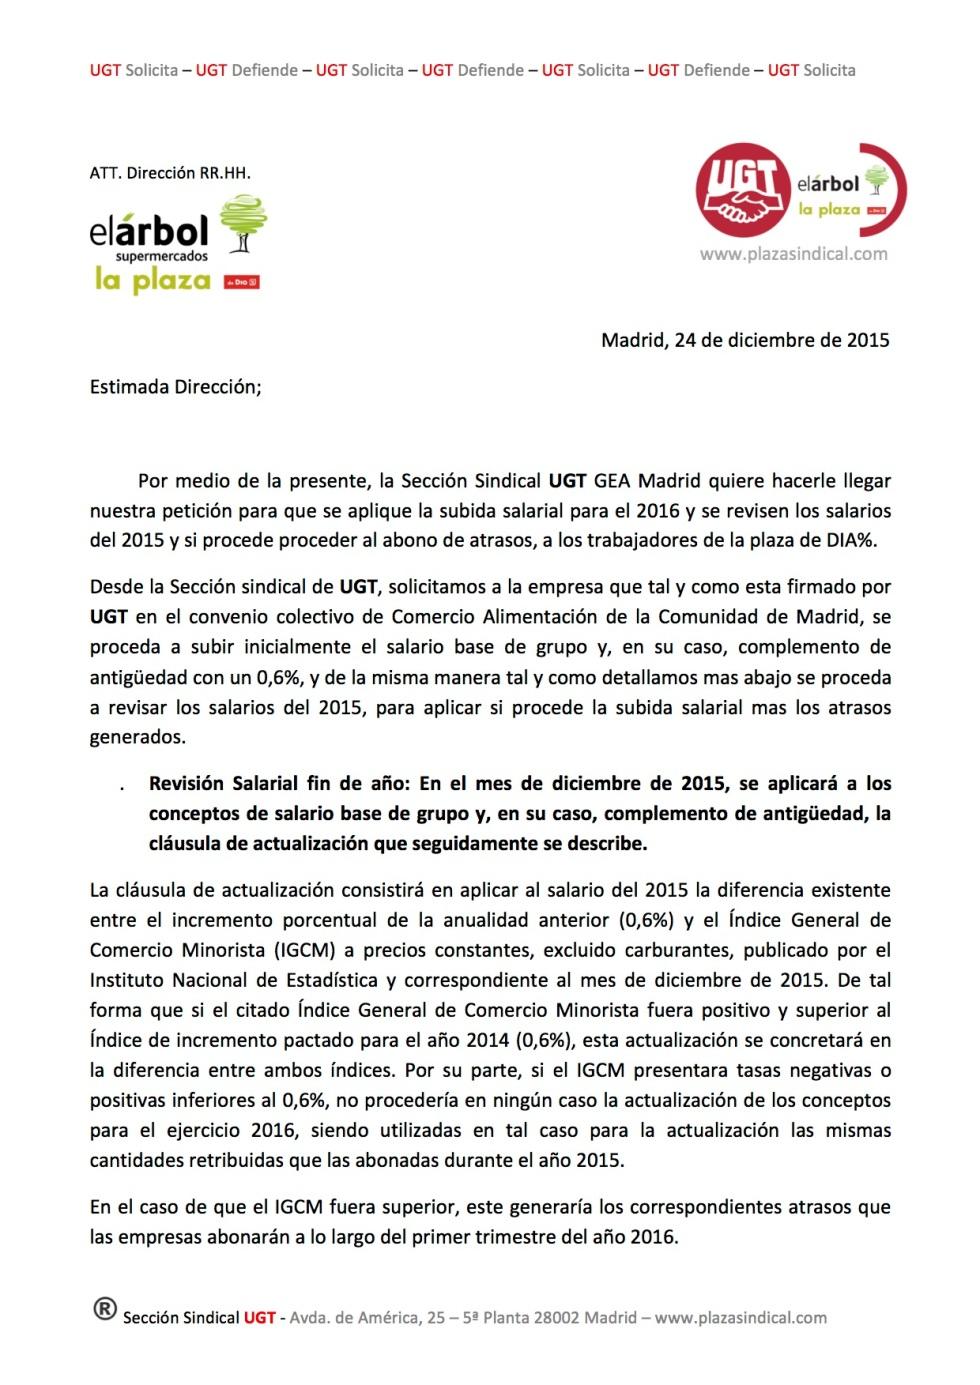 1 Subida Salarial 2016.jpg